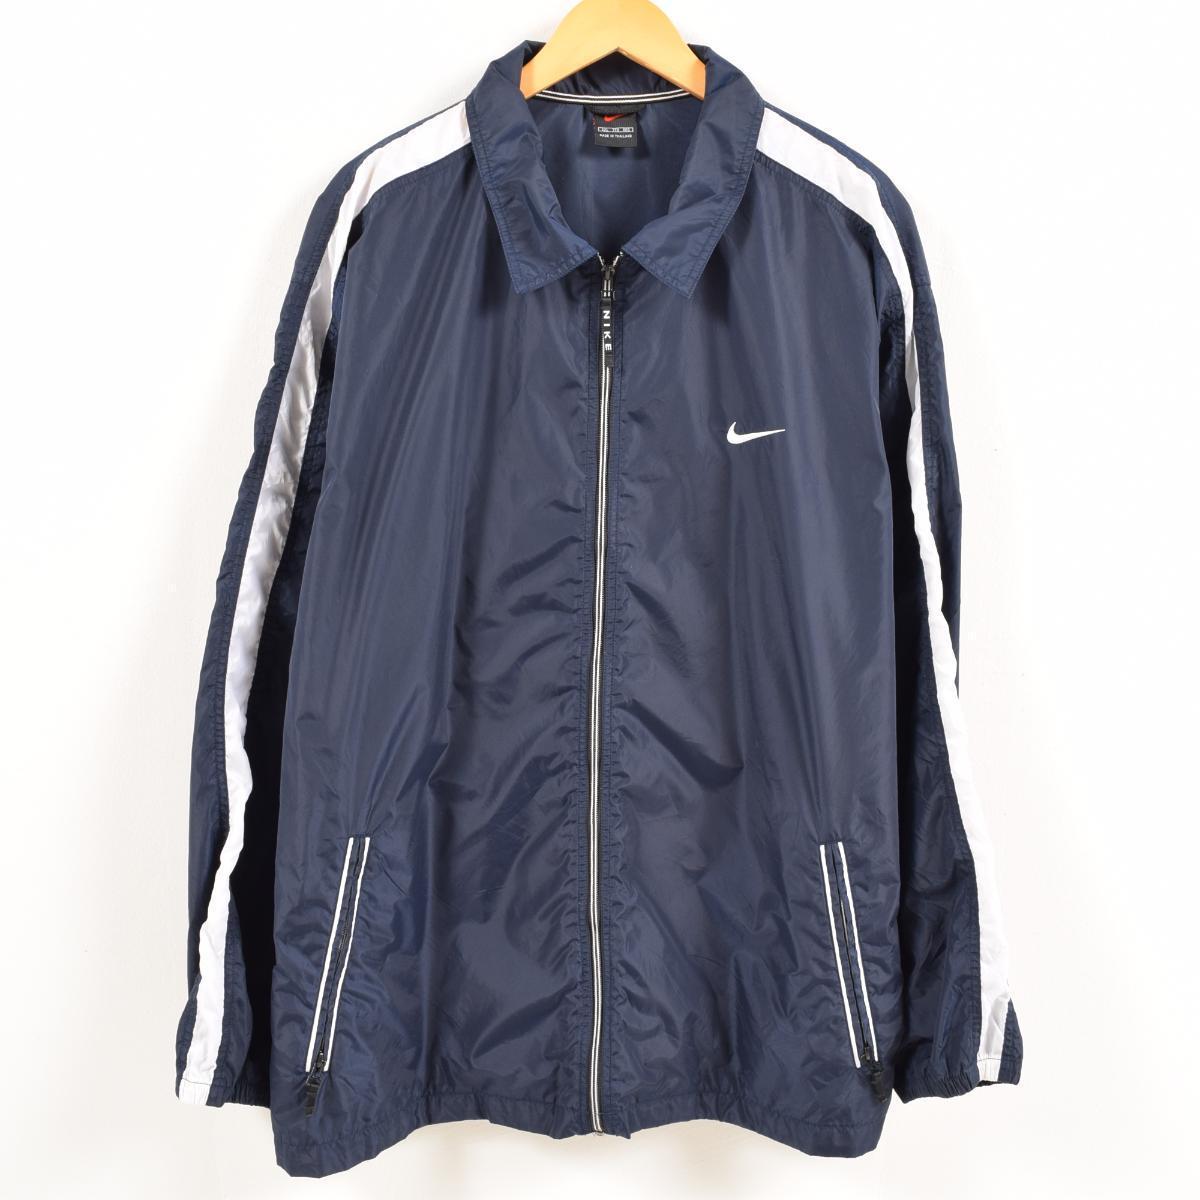 6595235e10 VINTAGE CLOTHING JAM  Nike NIKE nylon jacket men XXL  wax8224 ...